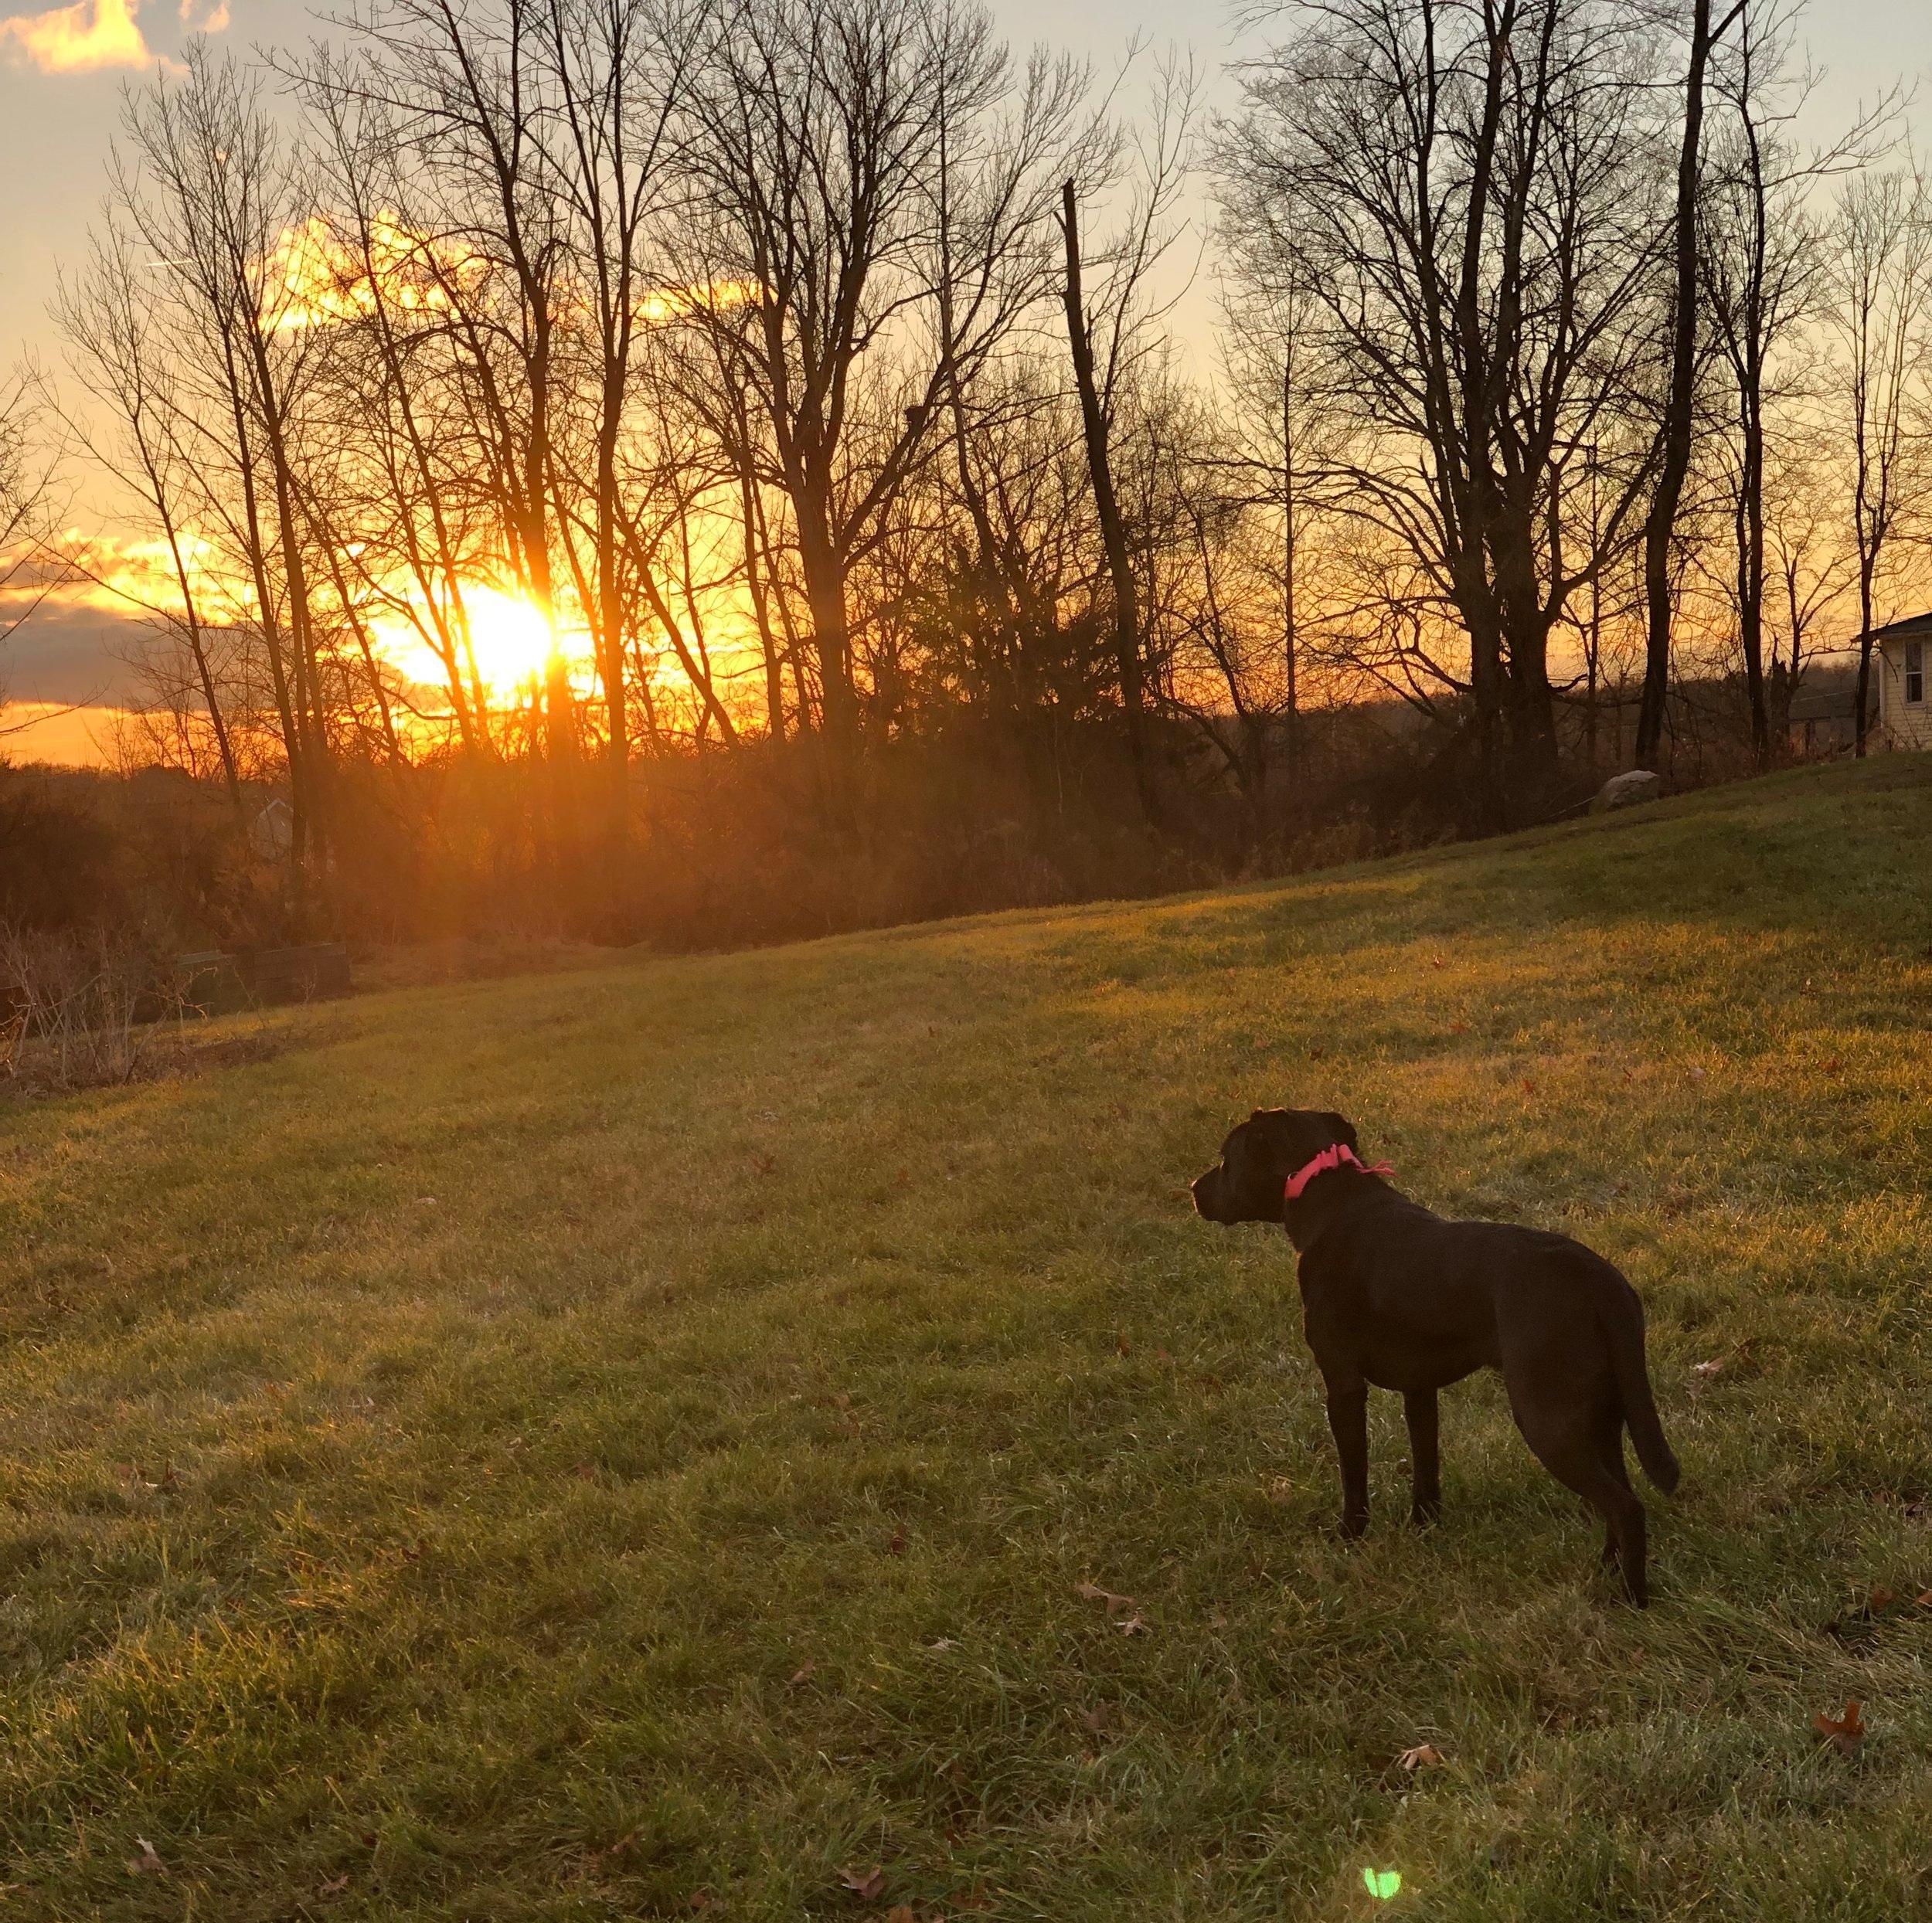 Enjoying a sunrise